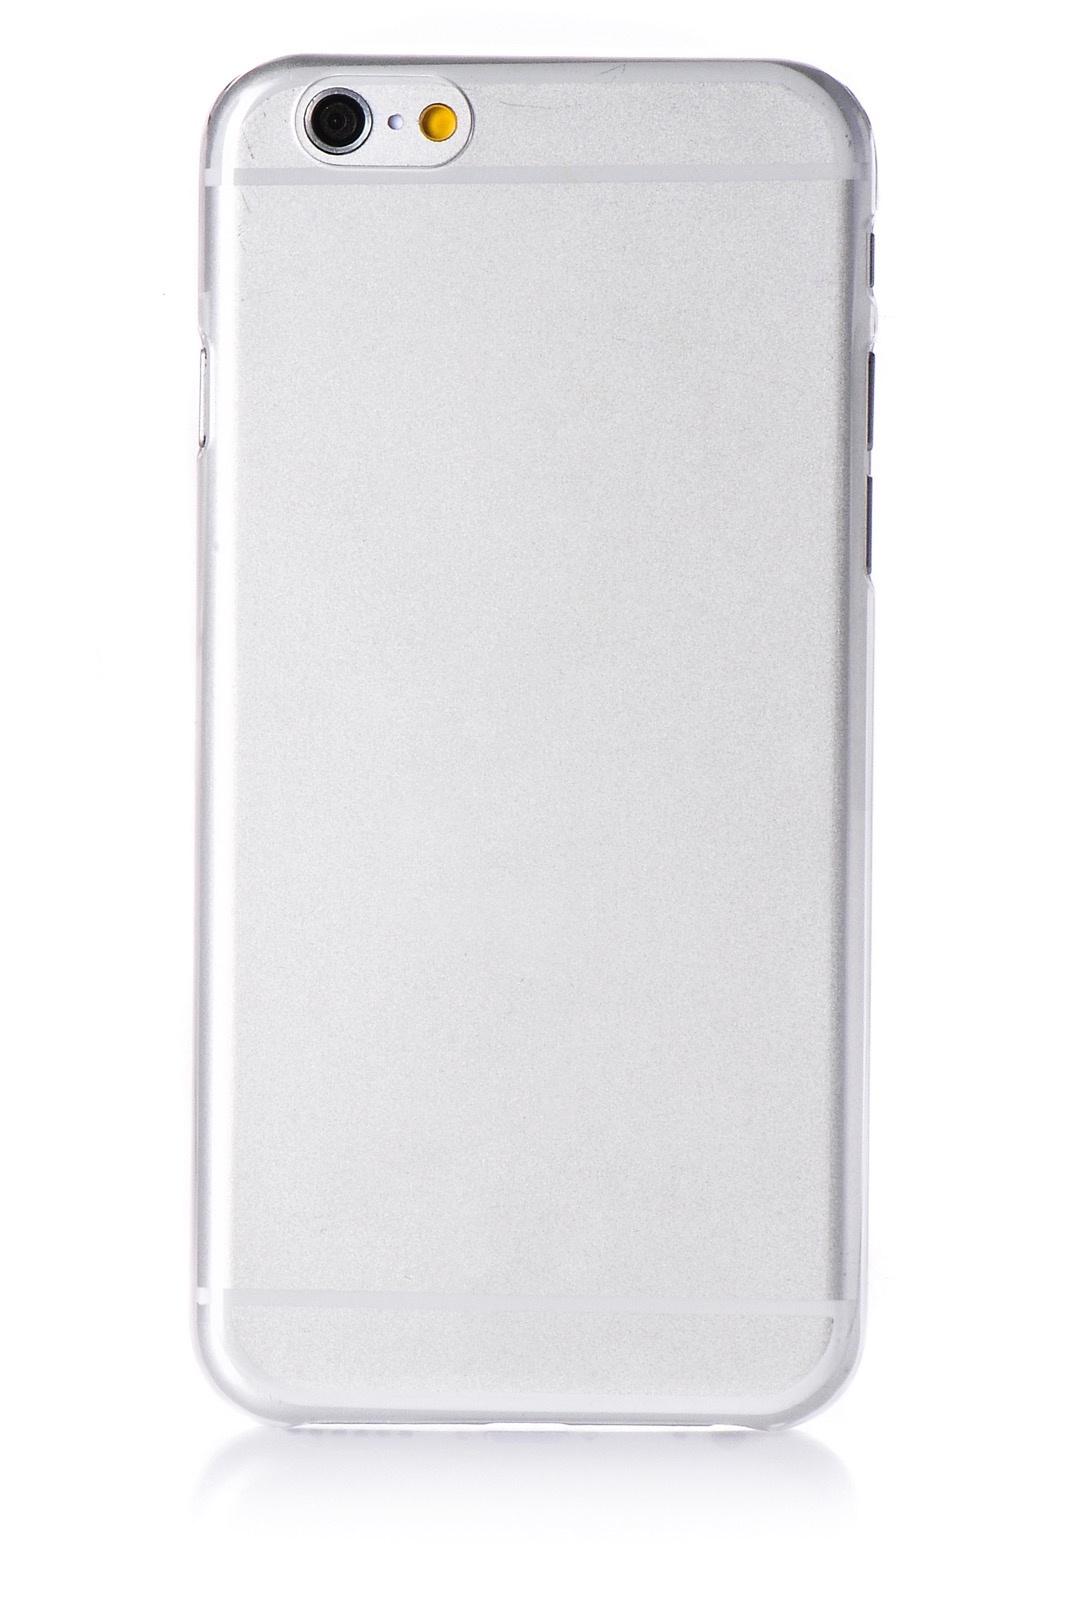 "Чехол для сотового телефона iNeez пластик sunlight 0.3mm для Apple iPhone 6 Plus/6S Plus 5.5"", прозрачный"